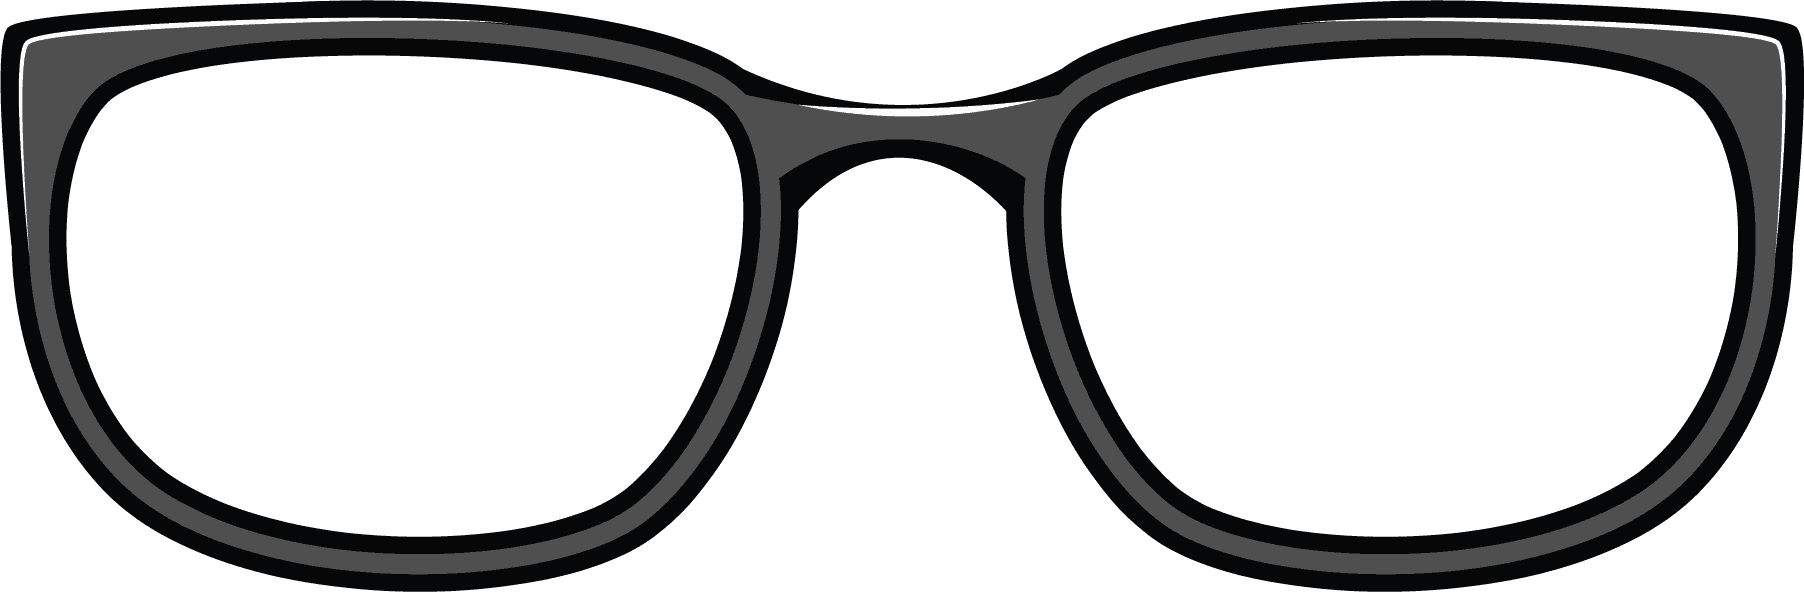 clip art free eyeglasses - photo #19